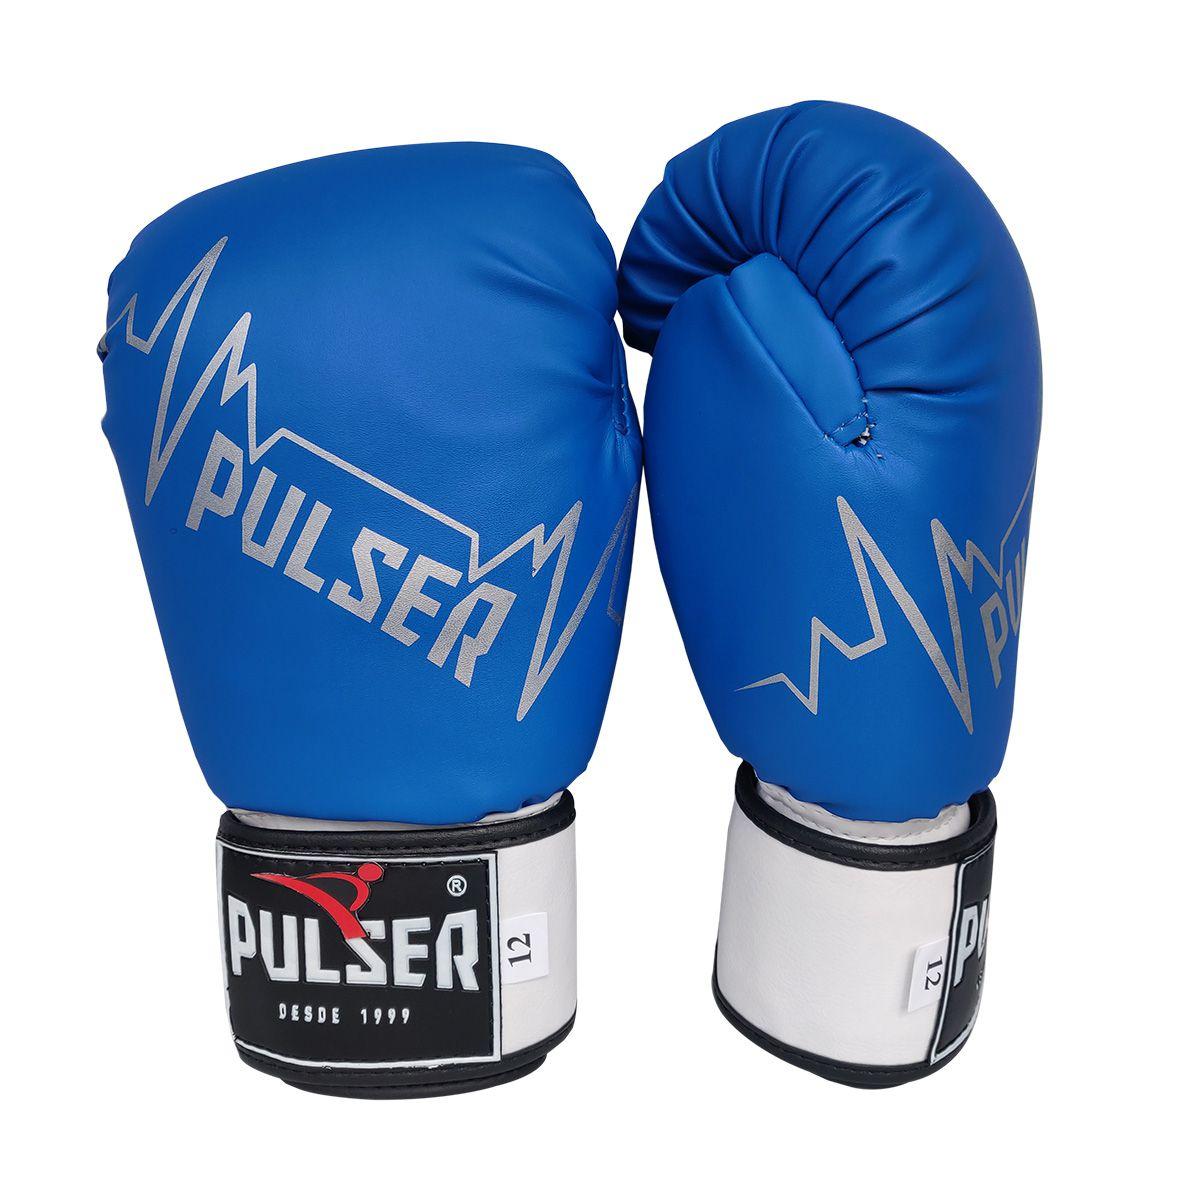 Kit de Muay Thai / Kickboxing 10oz - Azul / Preto Pulser Logo - Pulser  - PRALUTA SHOP